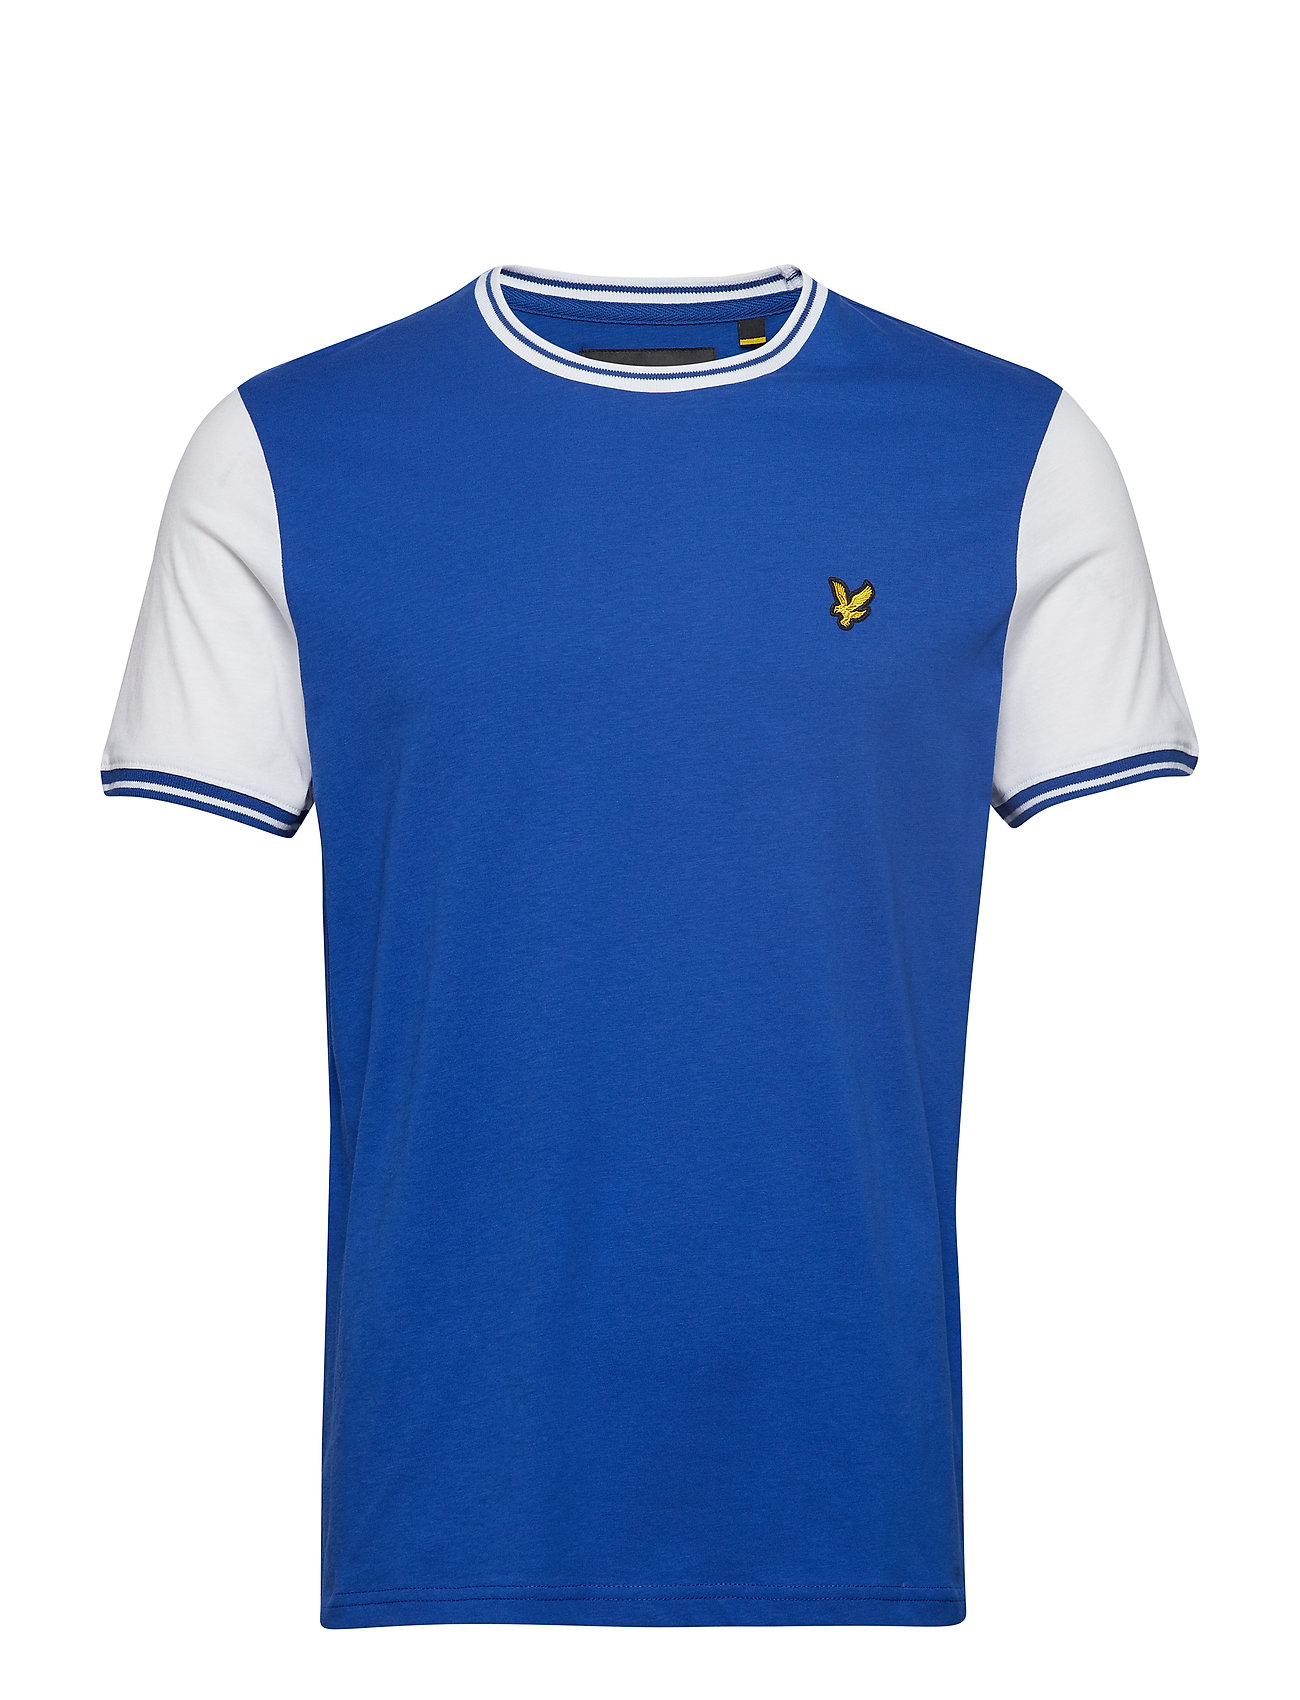 Lyle & Scott Tipped T-Shirt - DUKE BLUE/WHITE